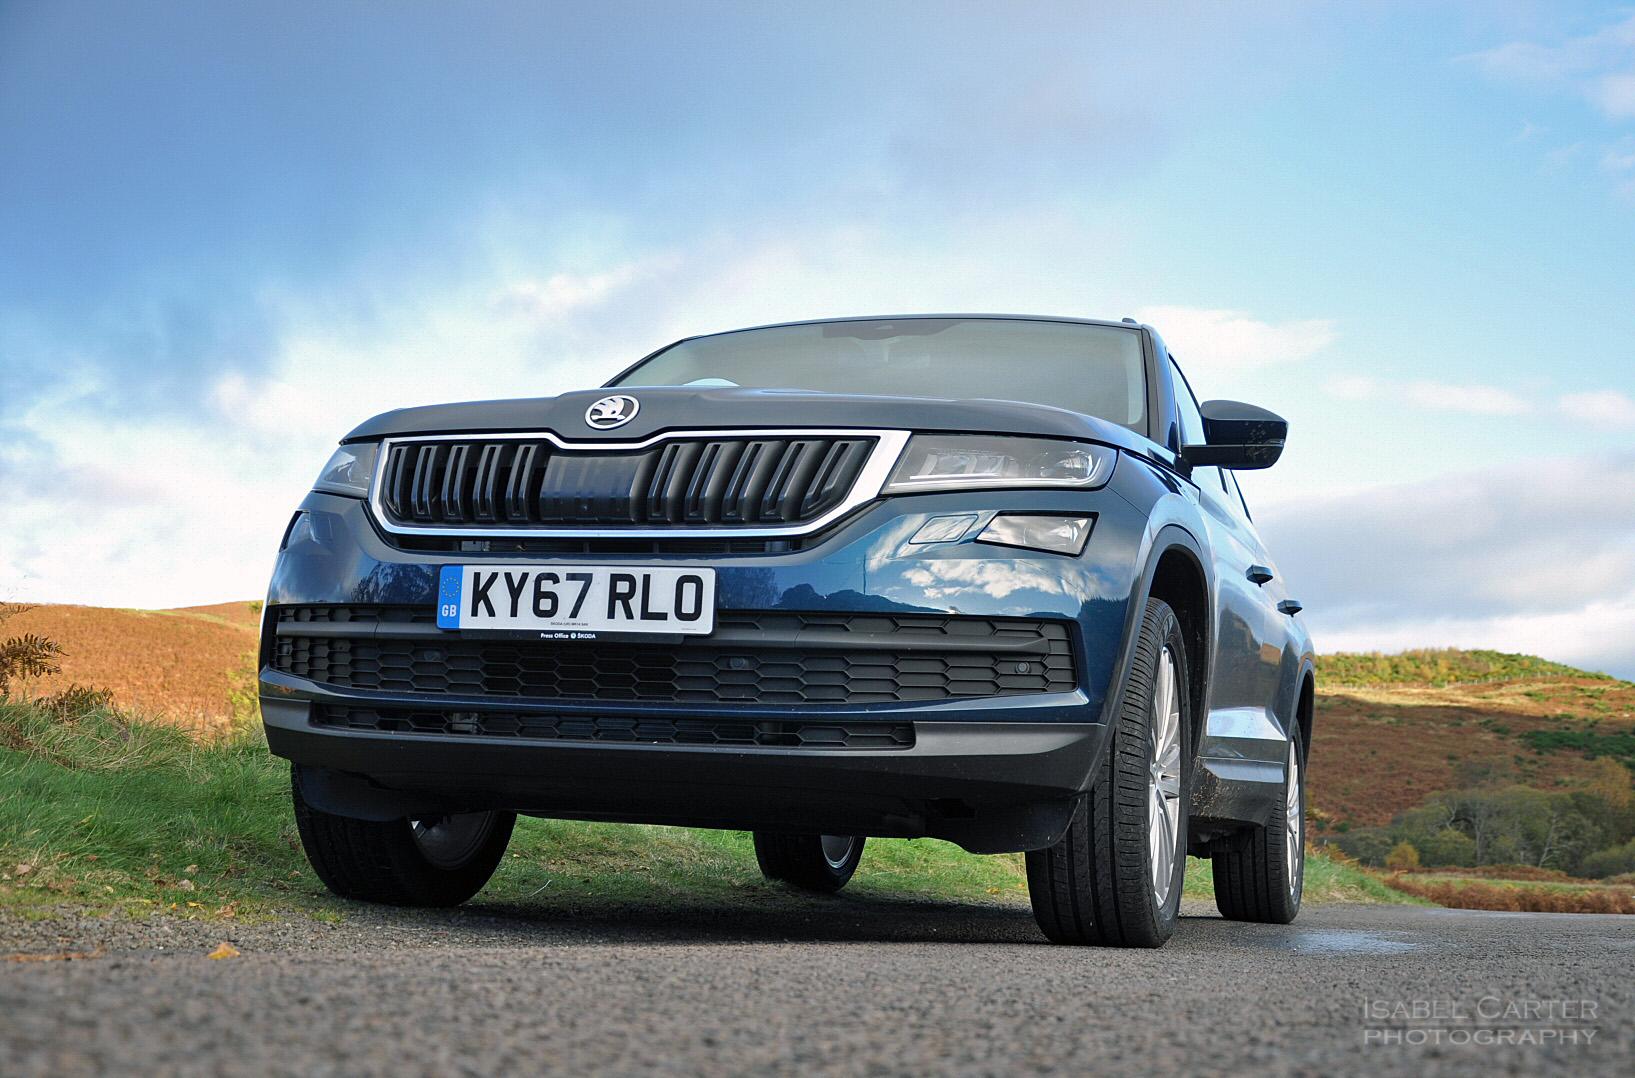 skoda kodiaq 4x4 7 seat suv road test review uk arty